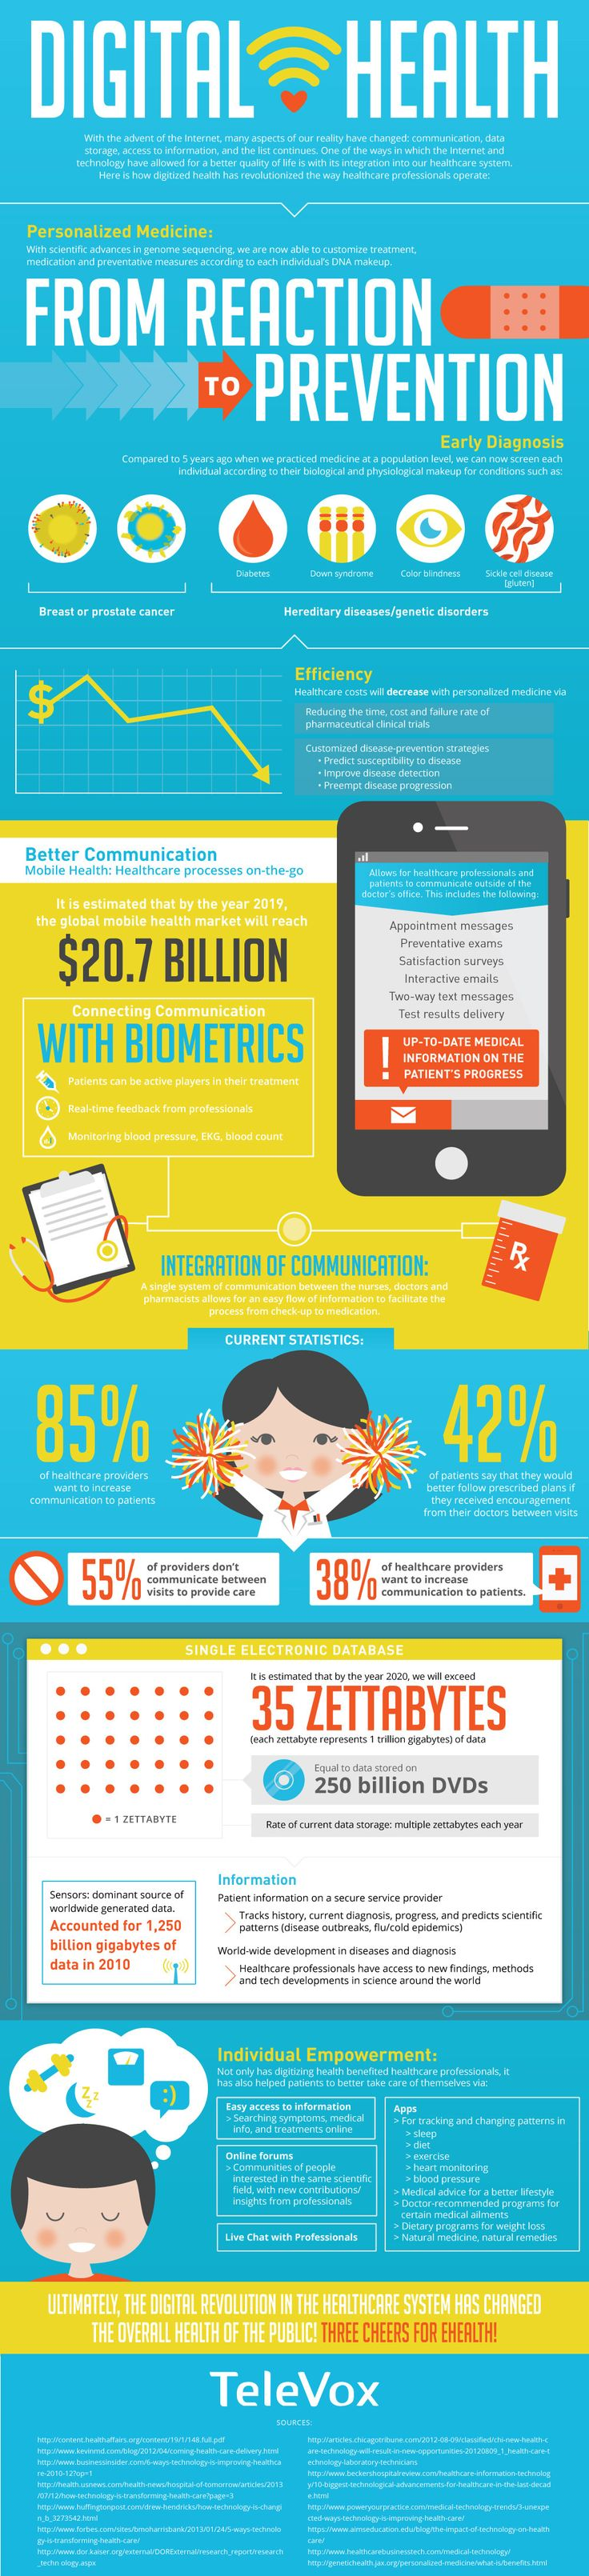 Digital Health #infographic